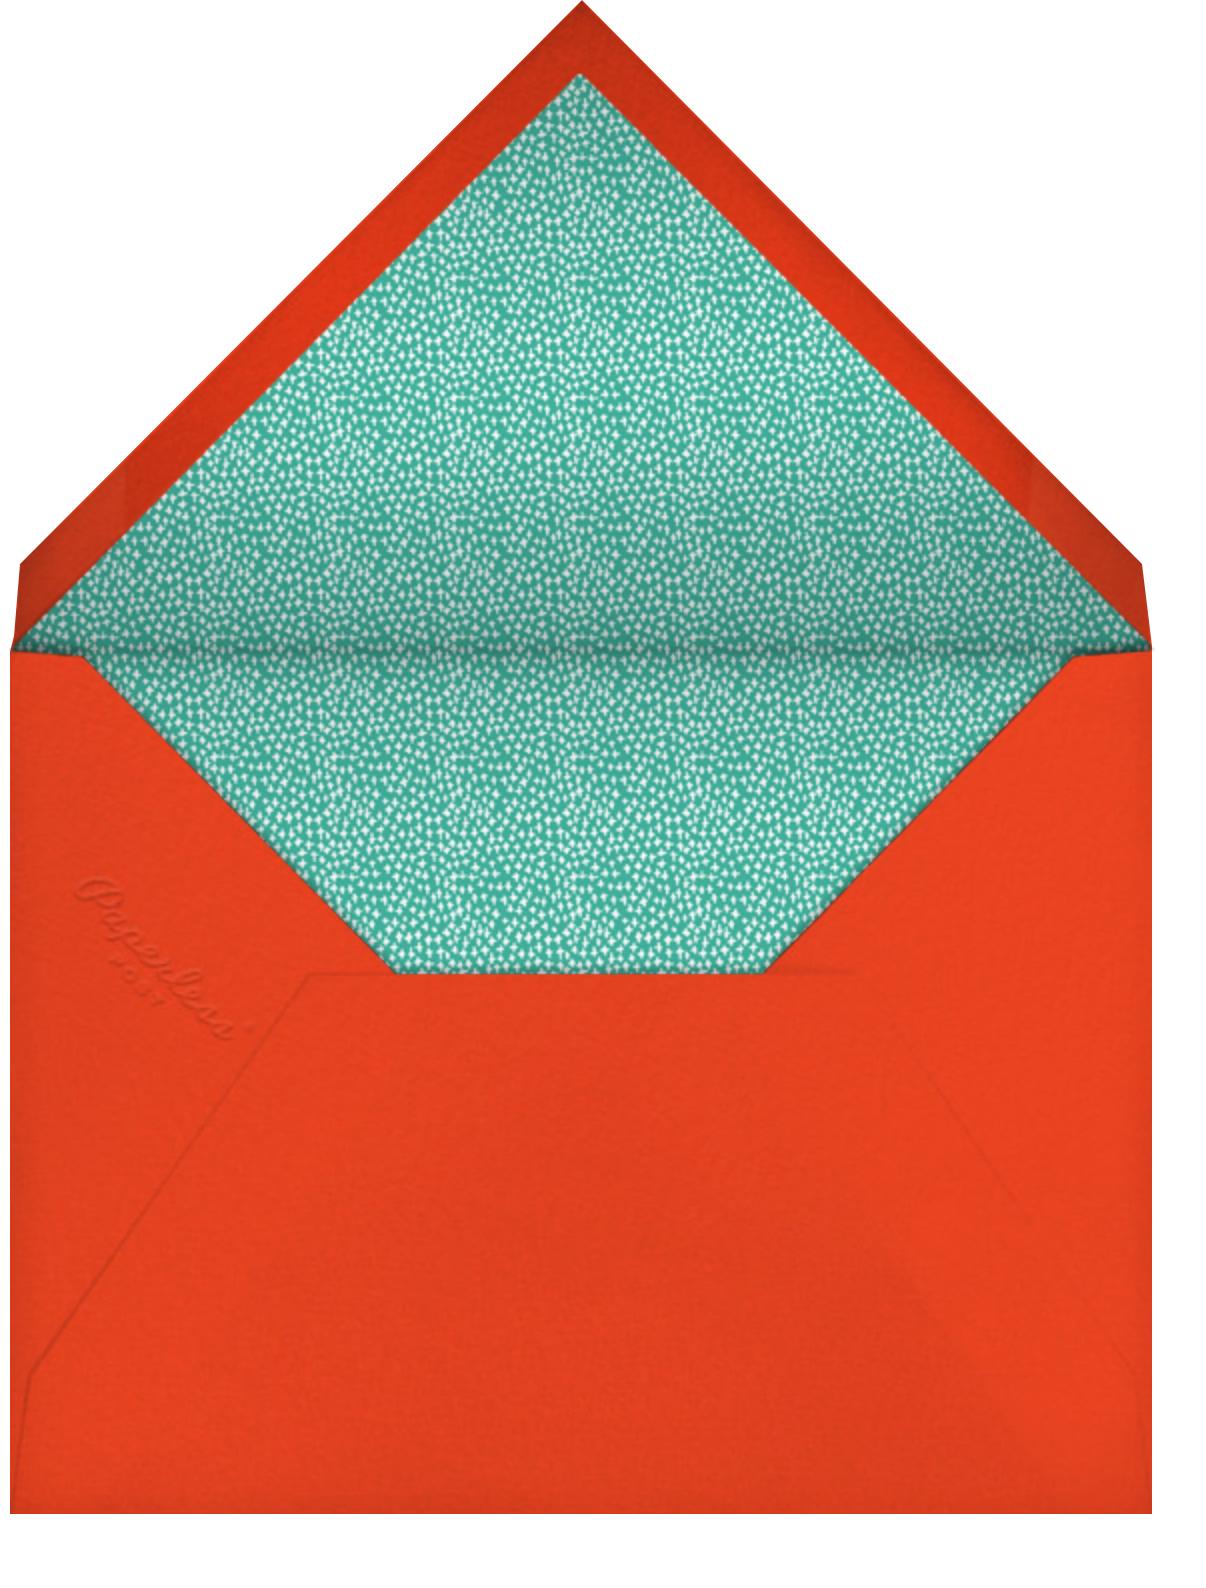 Hats on Parade - Mr. Boddington's Studio - Kids' birthday - envelope back